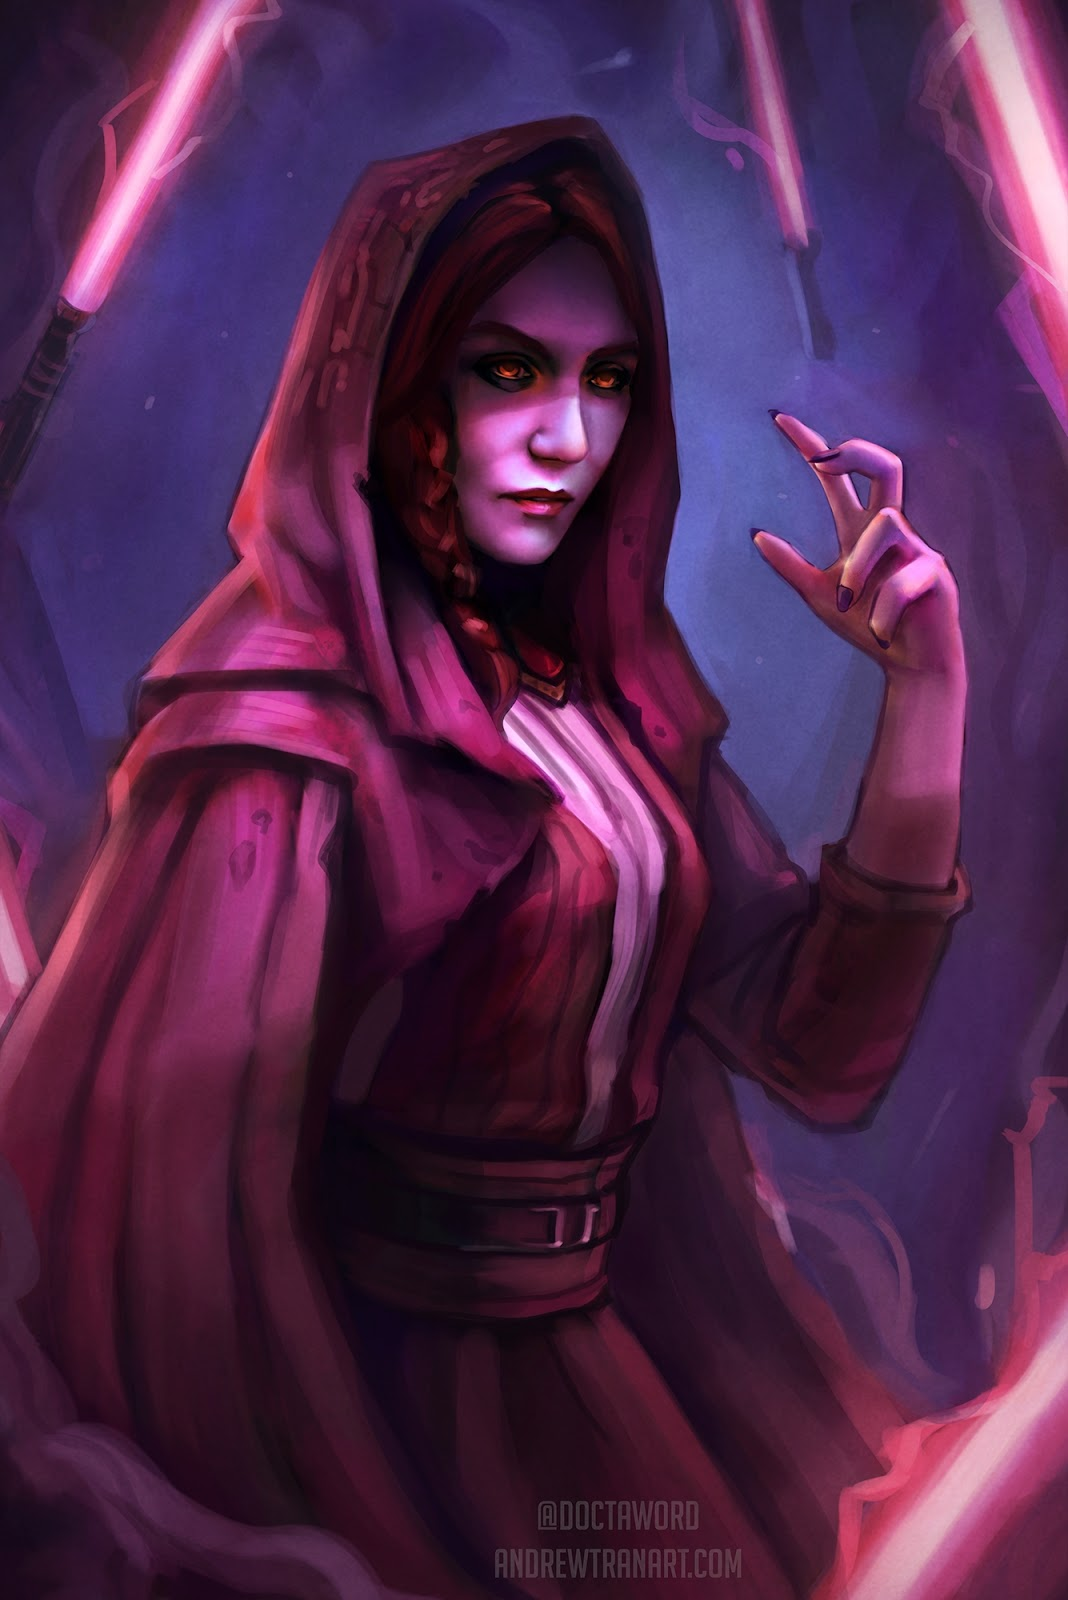 05-Melisandre-Carice-van-Houten-Andrew-D-Tran-Doctaword-Star-Wars-and-Game-of-Thrones-Mashup-www-designstack-co